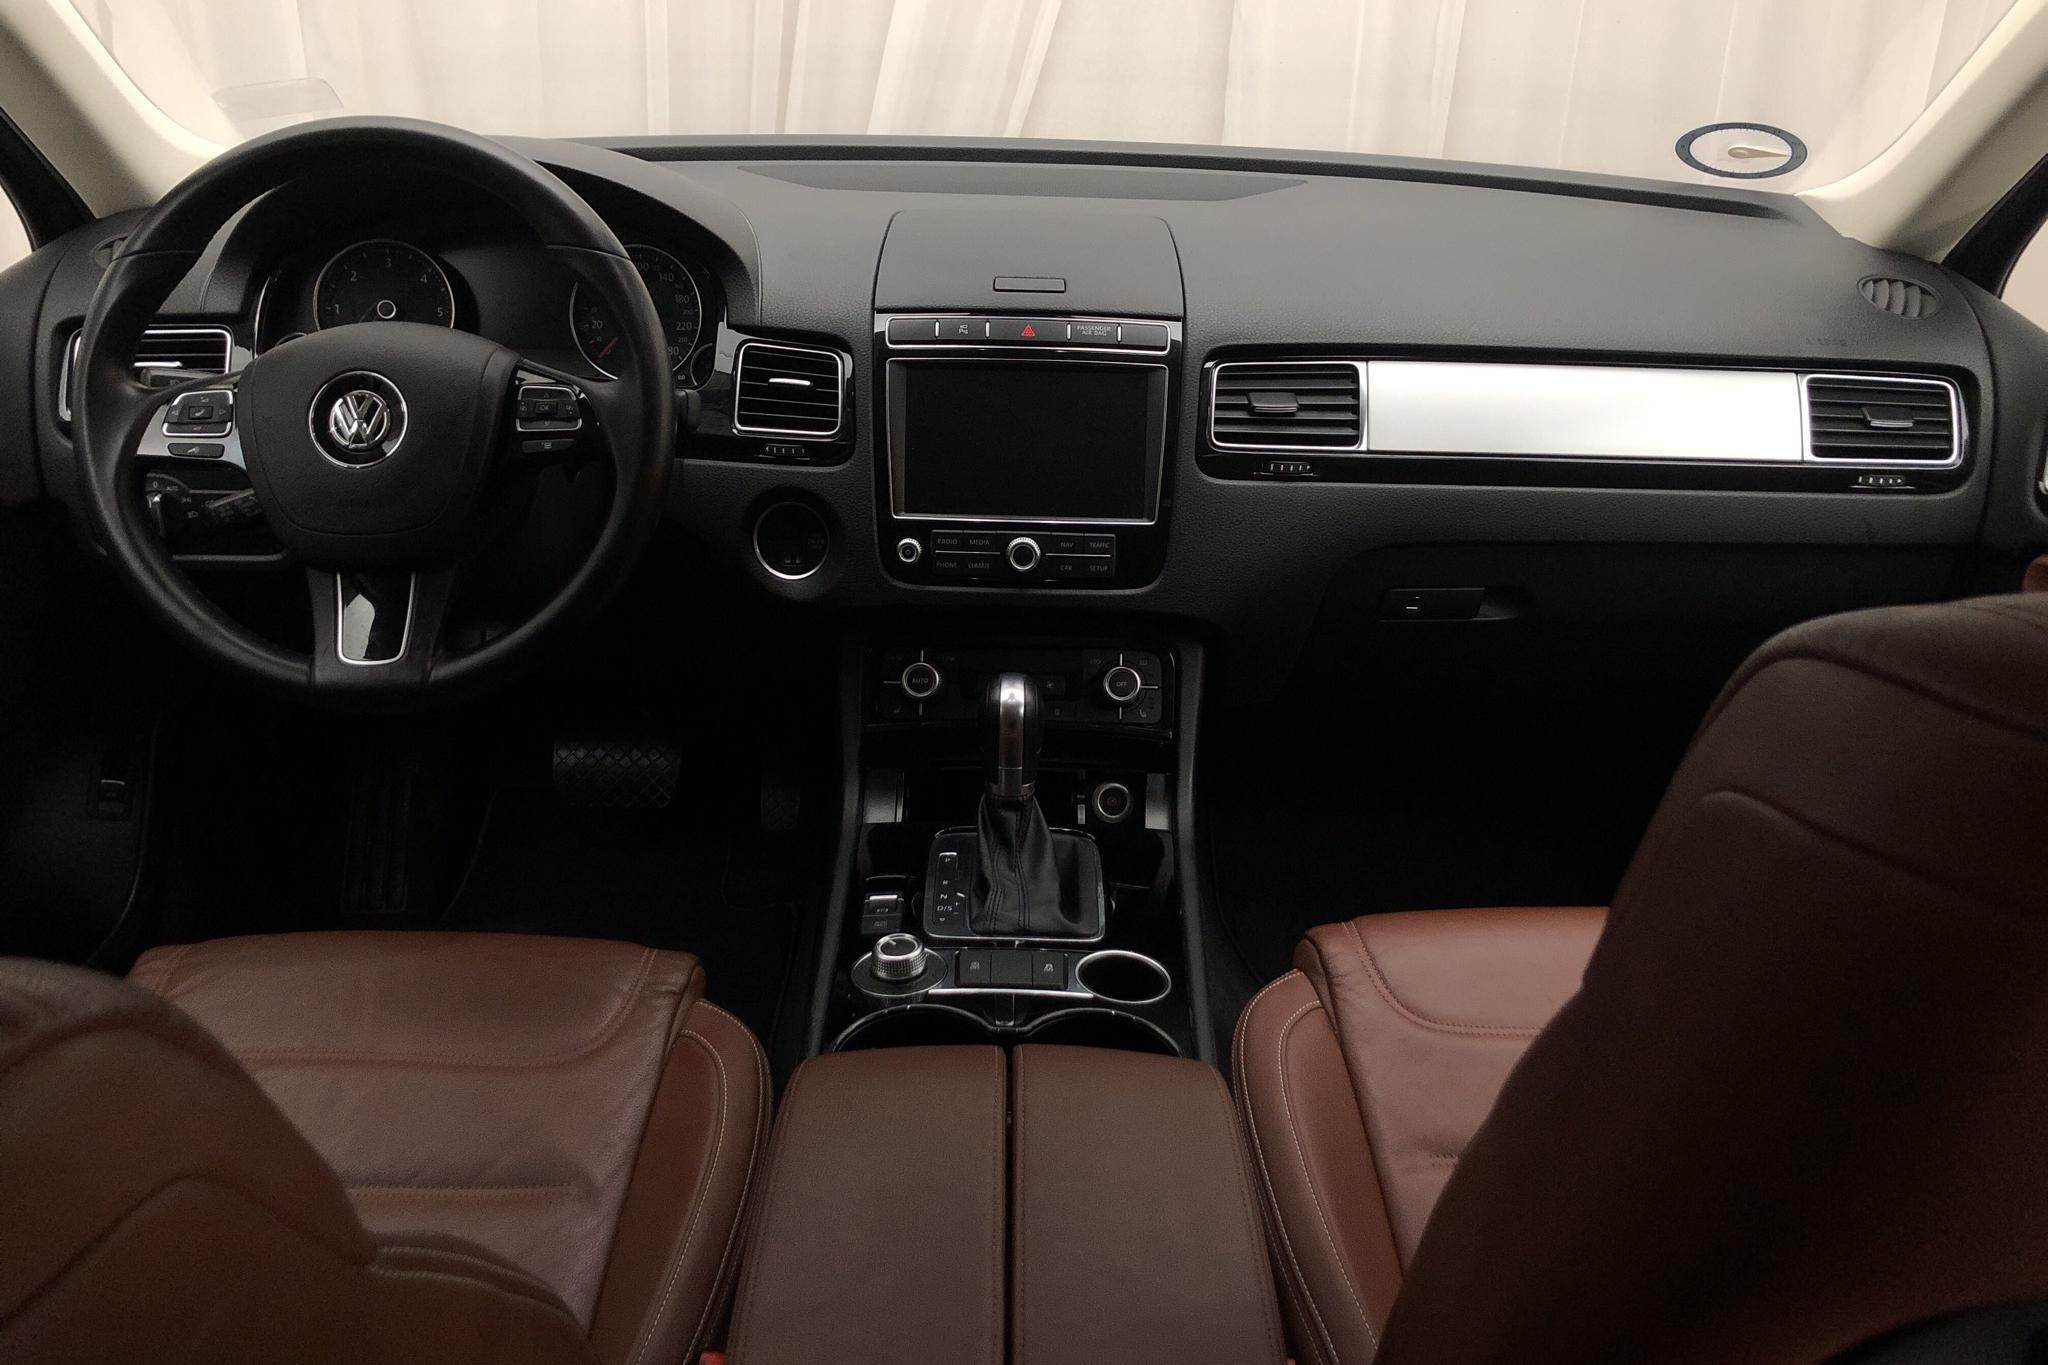 VW Touareg 3.0 TDI BlueMotion Technology (204hk) - 13 787 mil - Automat - vit - 2018